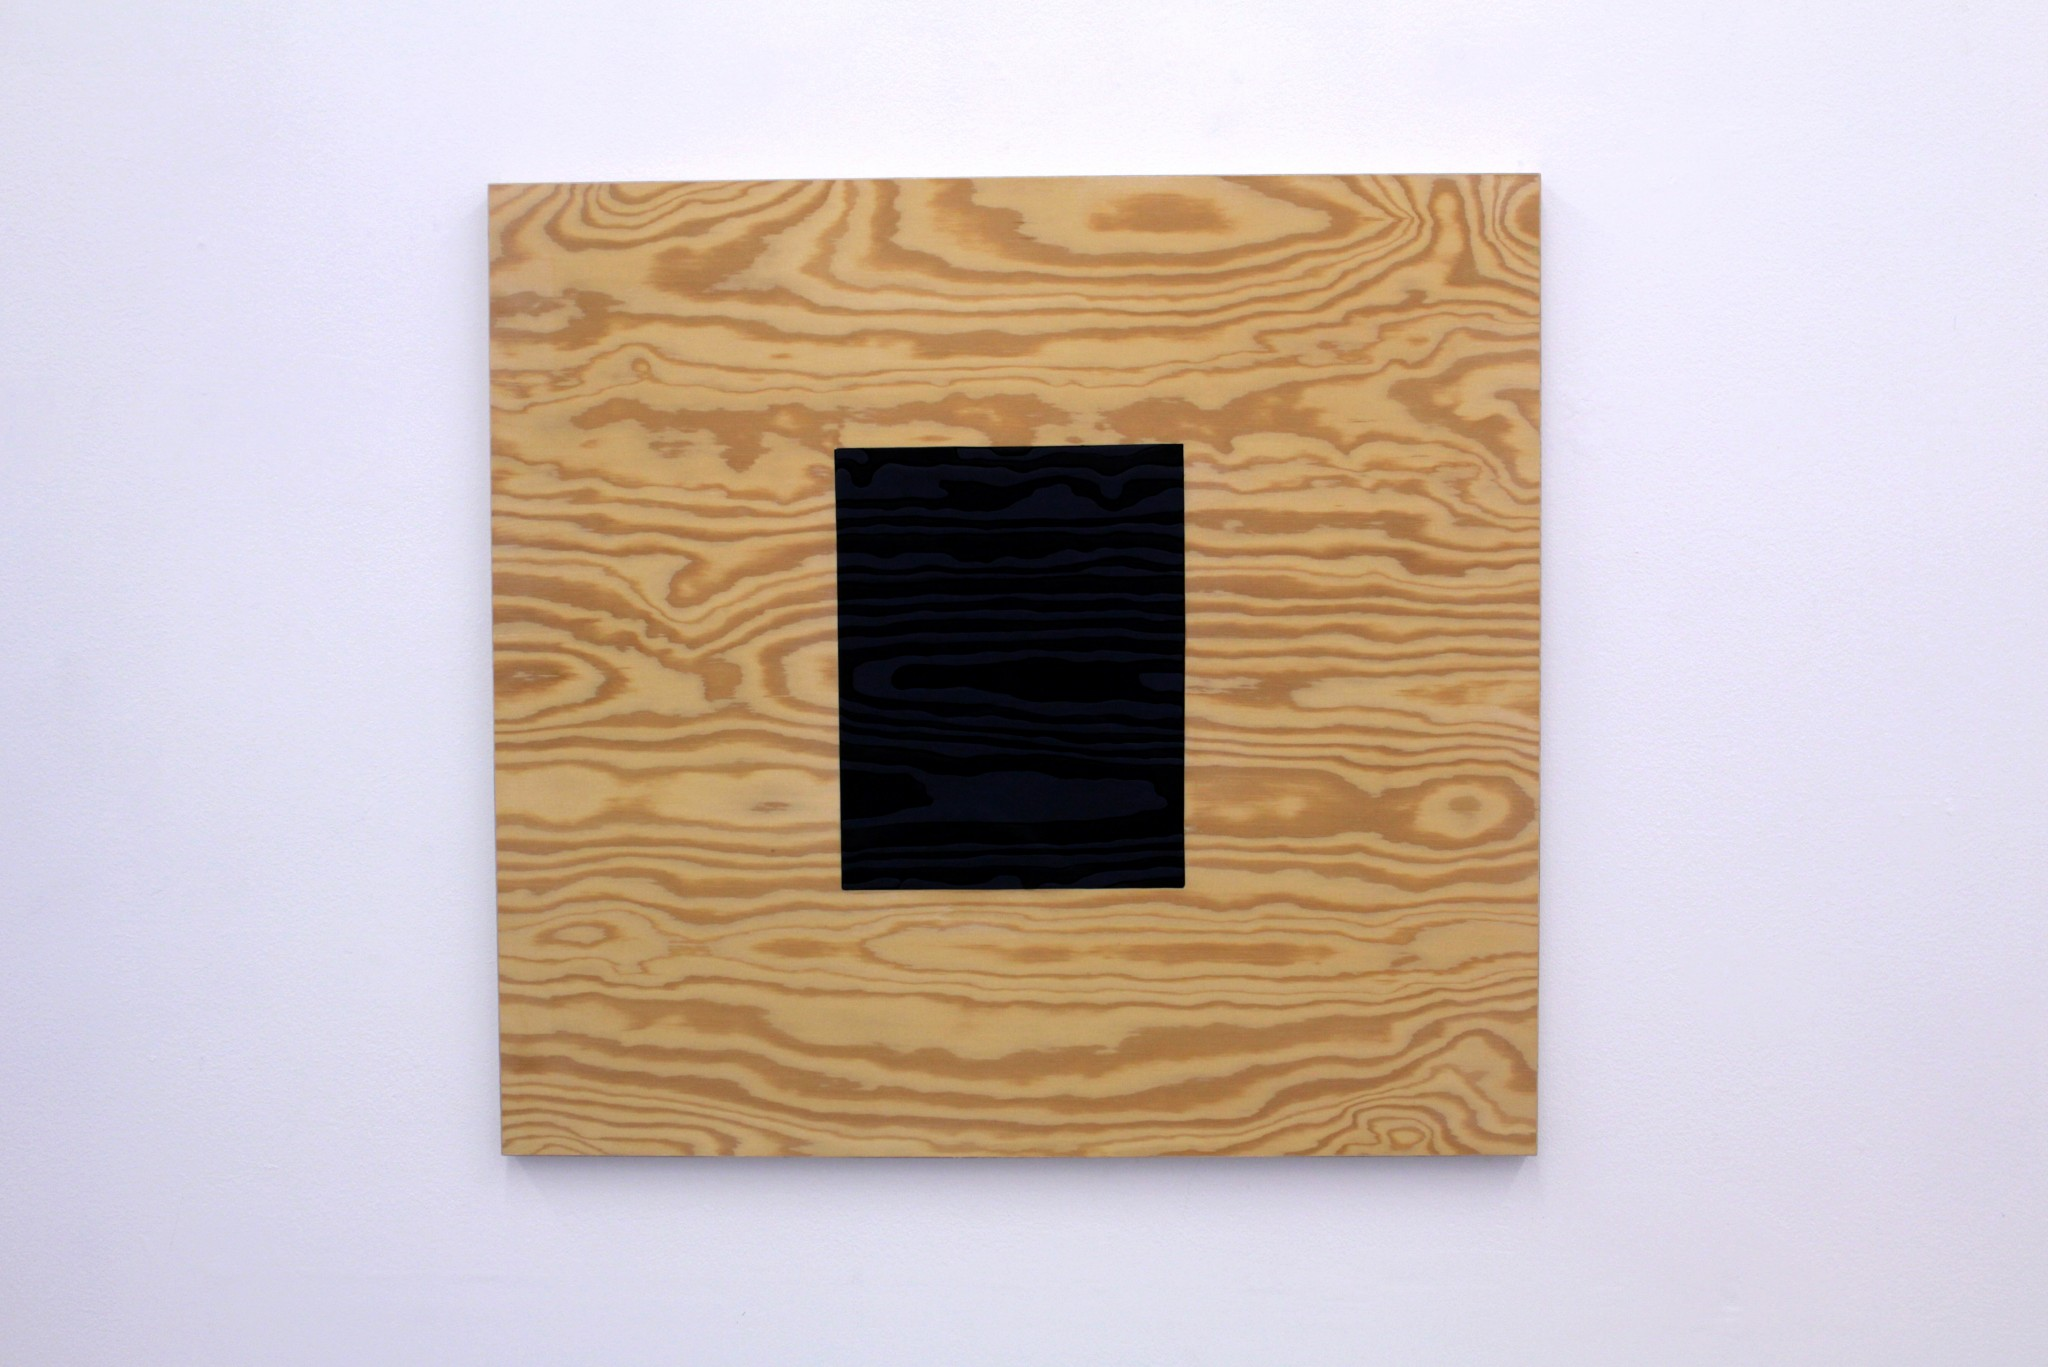 within-within-62x65cm-2018-Material-vaxad-träpanel-vinylfärg-1